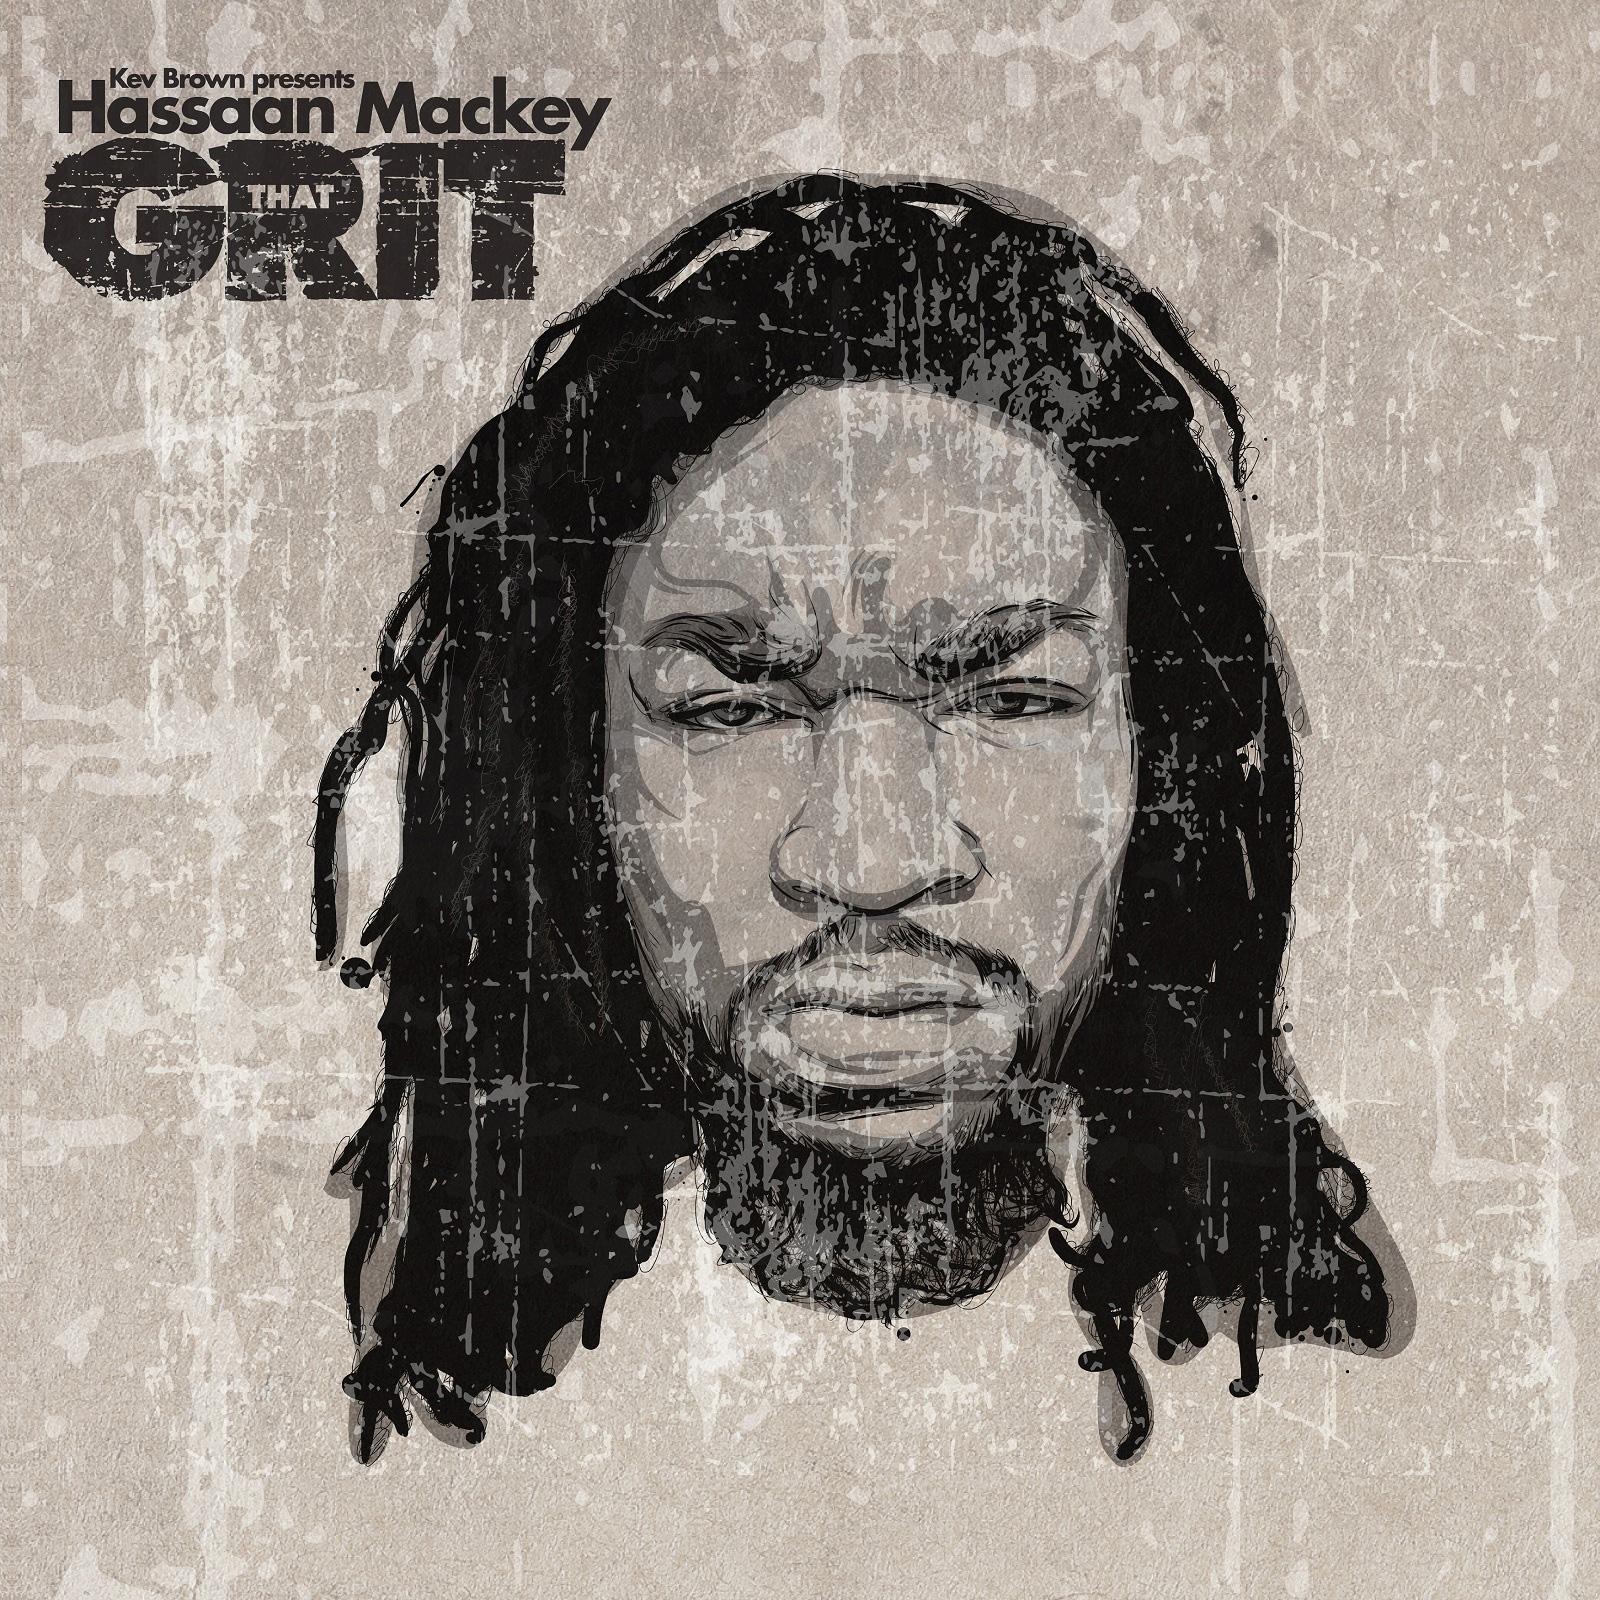 Kev_brown___hassaan_mackey_-_that_grift